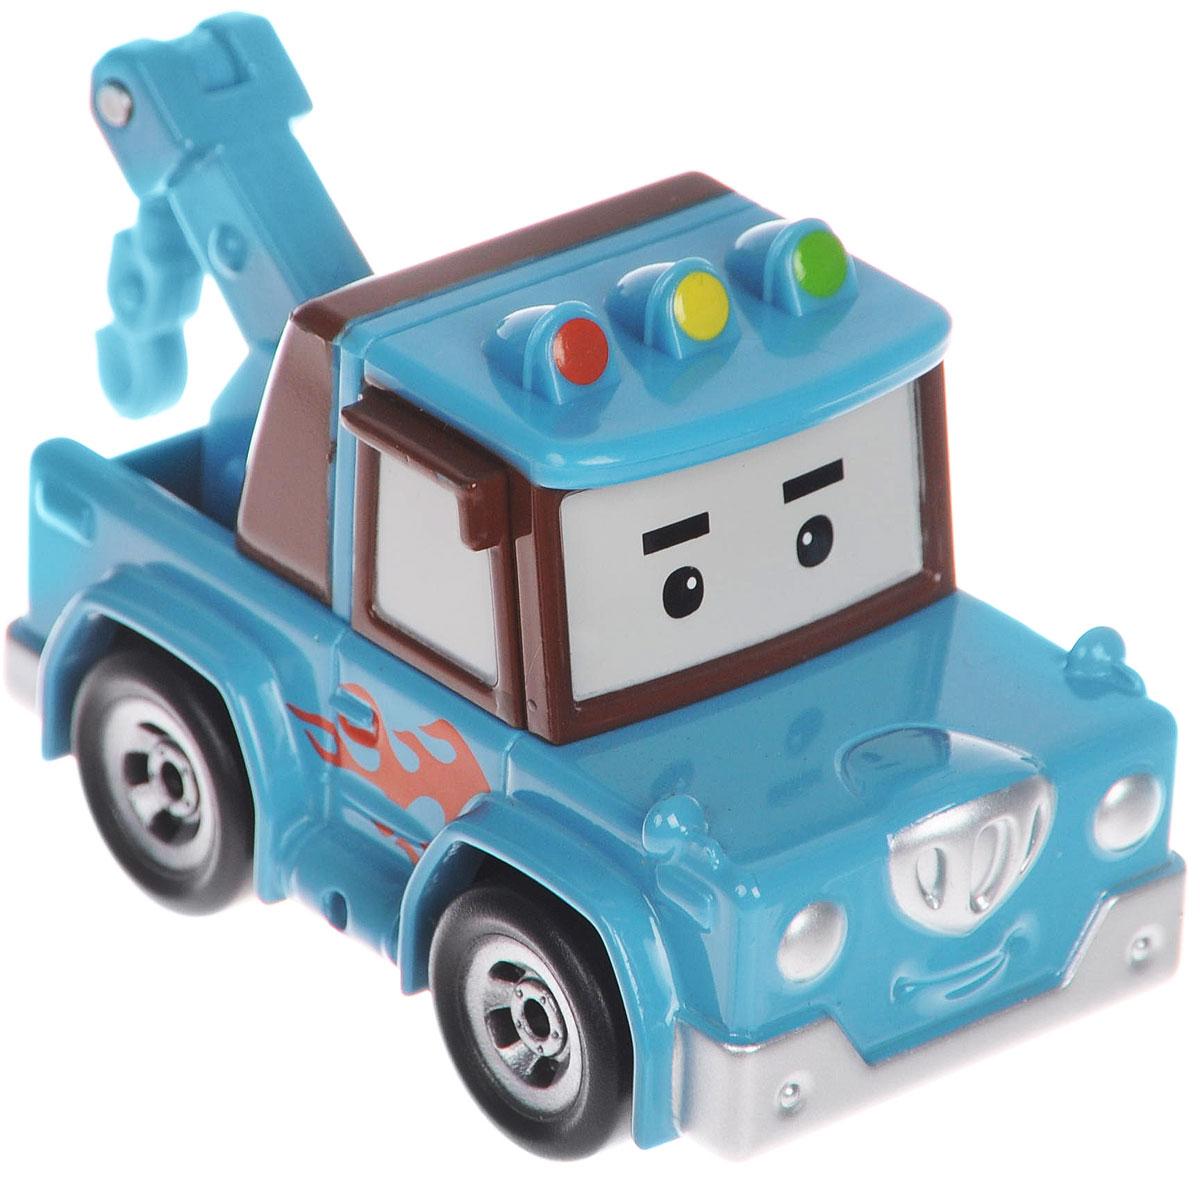 Robocar Poli Эвакуатор Спуки robocar poli poli helly amber roy transformable robot toys